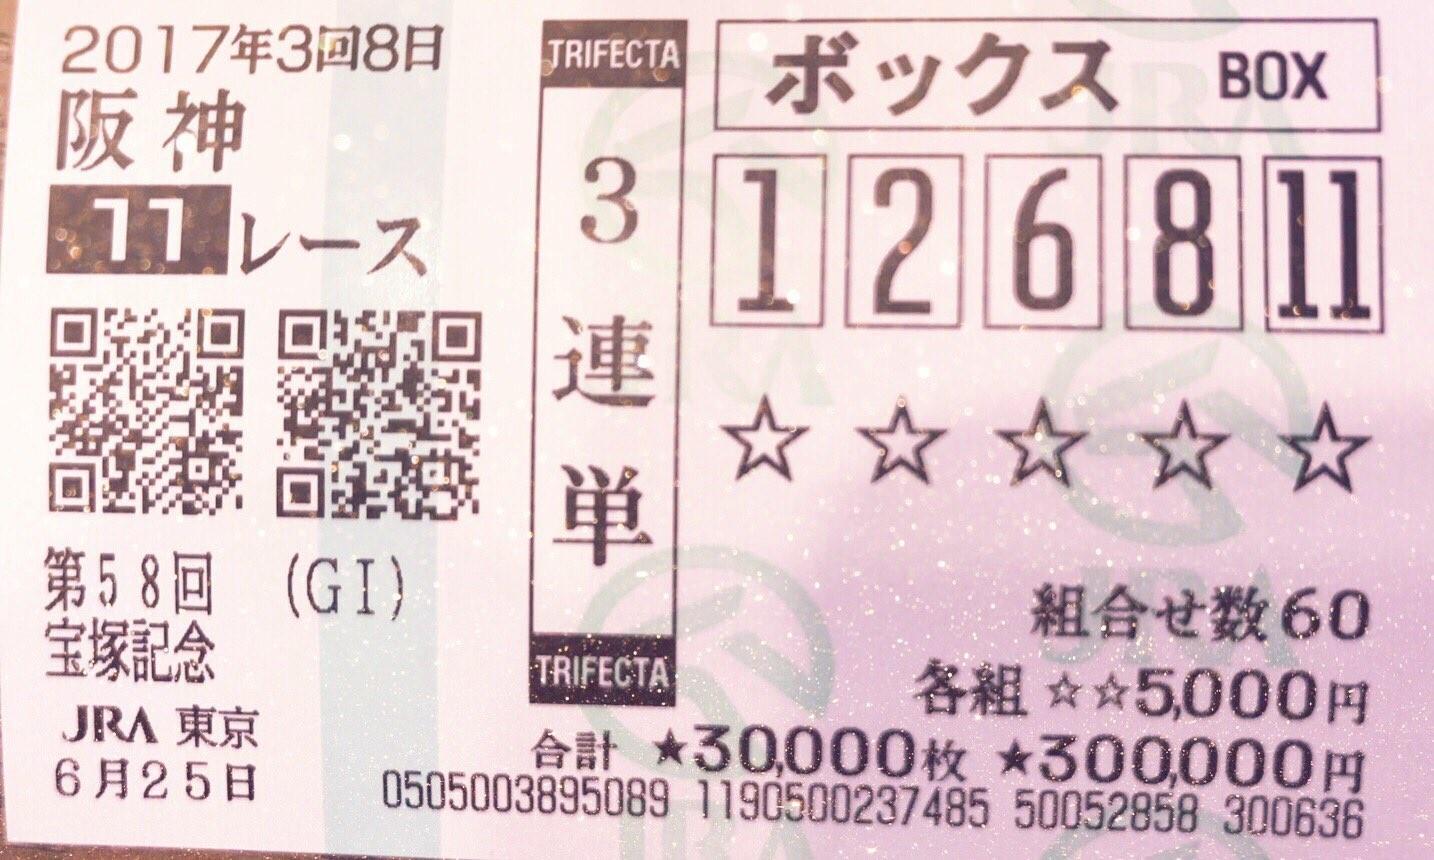 「AV界賭神」明日花綺羅又中大獎,不到2個月爽賺近3百萬